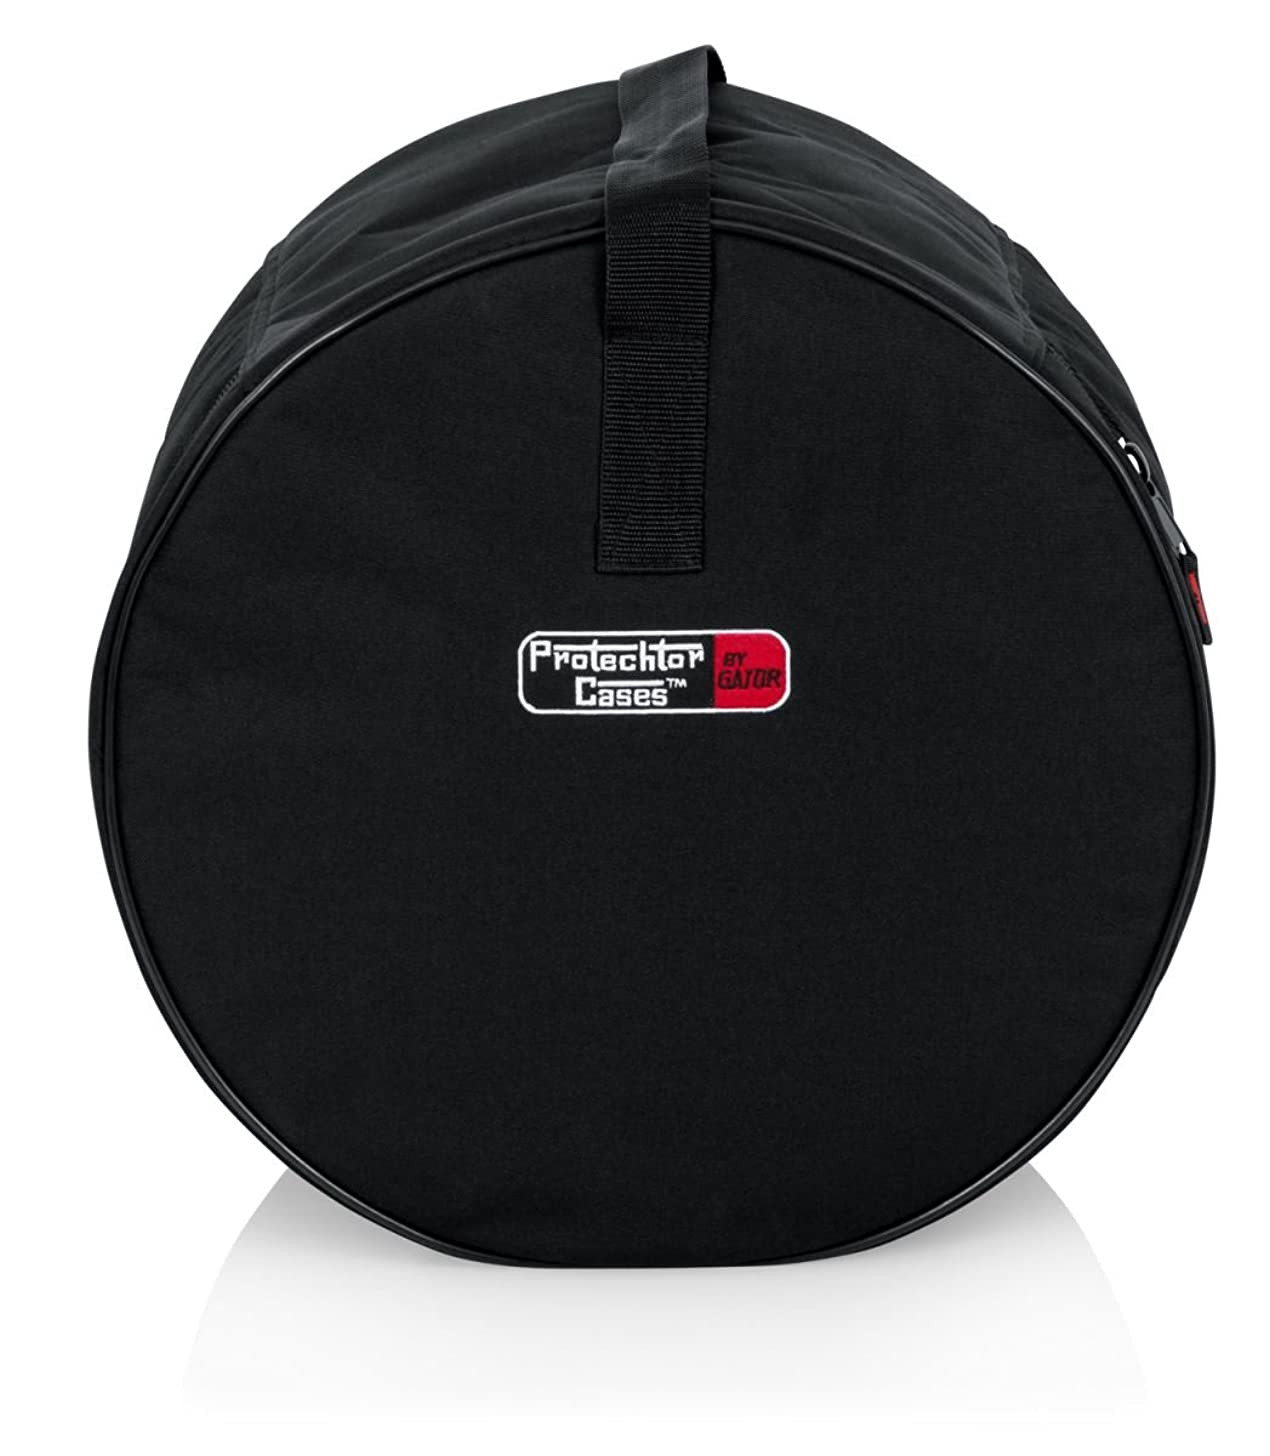 Gator Cases Protechtor Series Padded Drum Bag; Tom 13